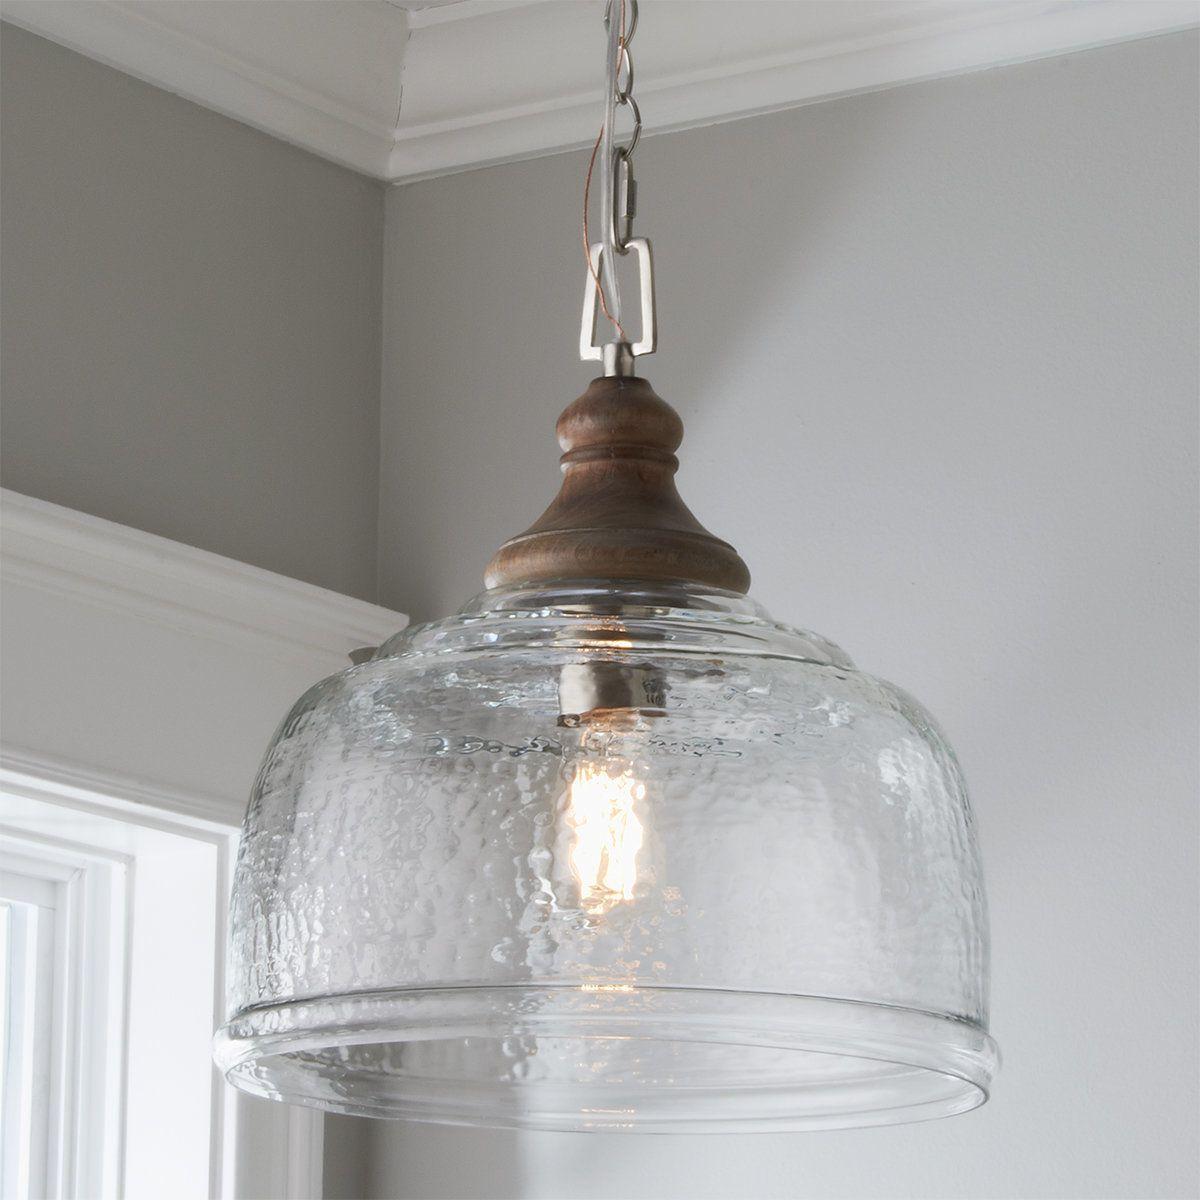 Organic Rippled Glass Pendant In 2021 Glass Pendant Light Glass Lighting Kitchen Lighting Fixtures Glass shades for hanging lights